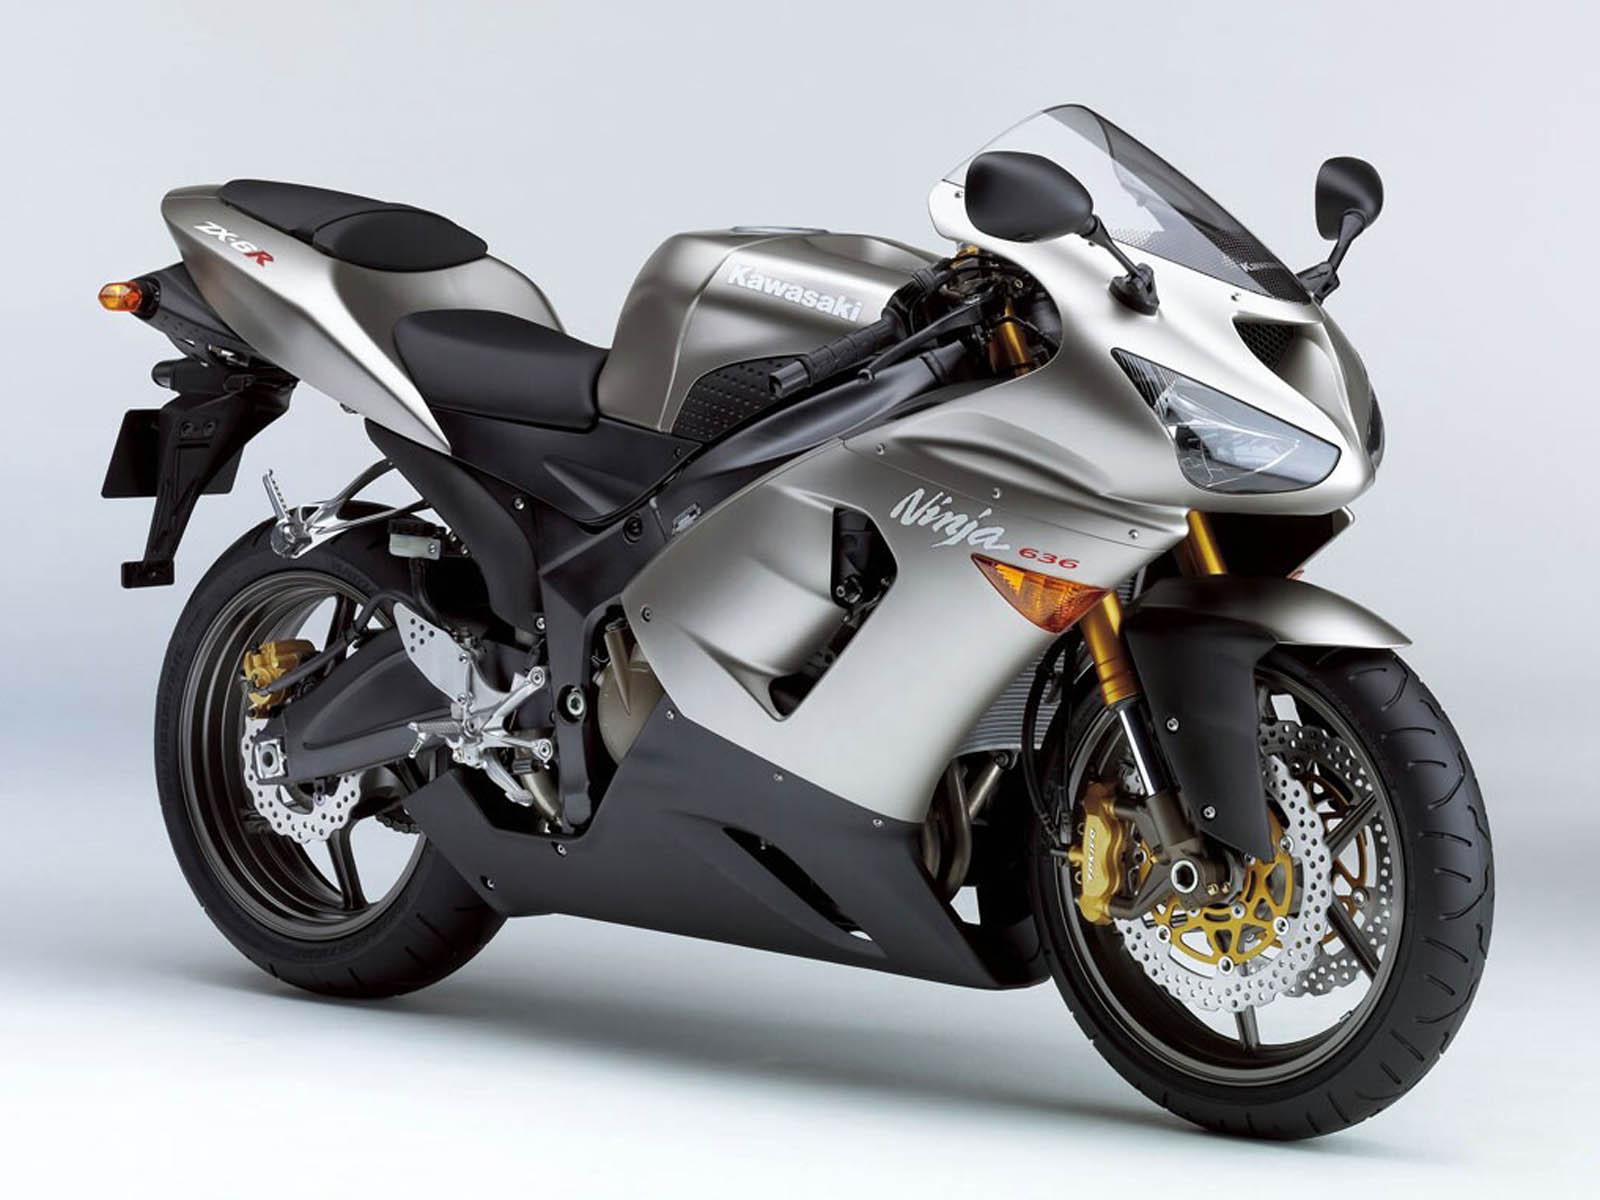 Wallpaper sports motorcycles wallpapers - Superbike wallpaper ...